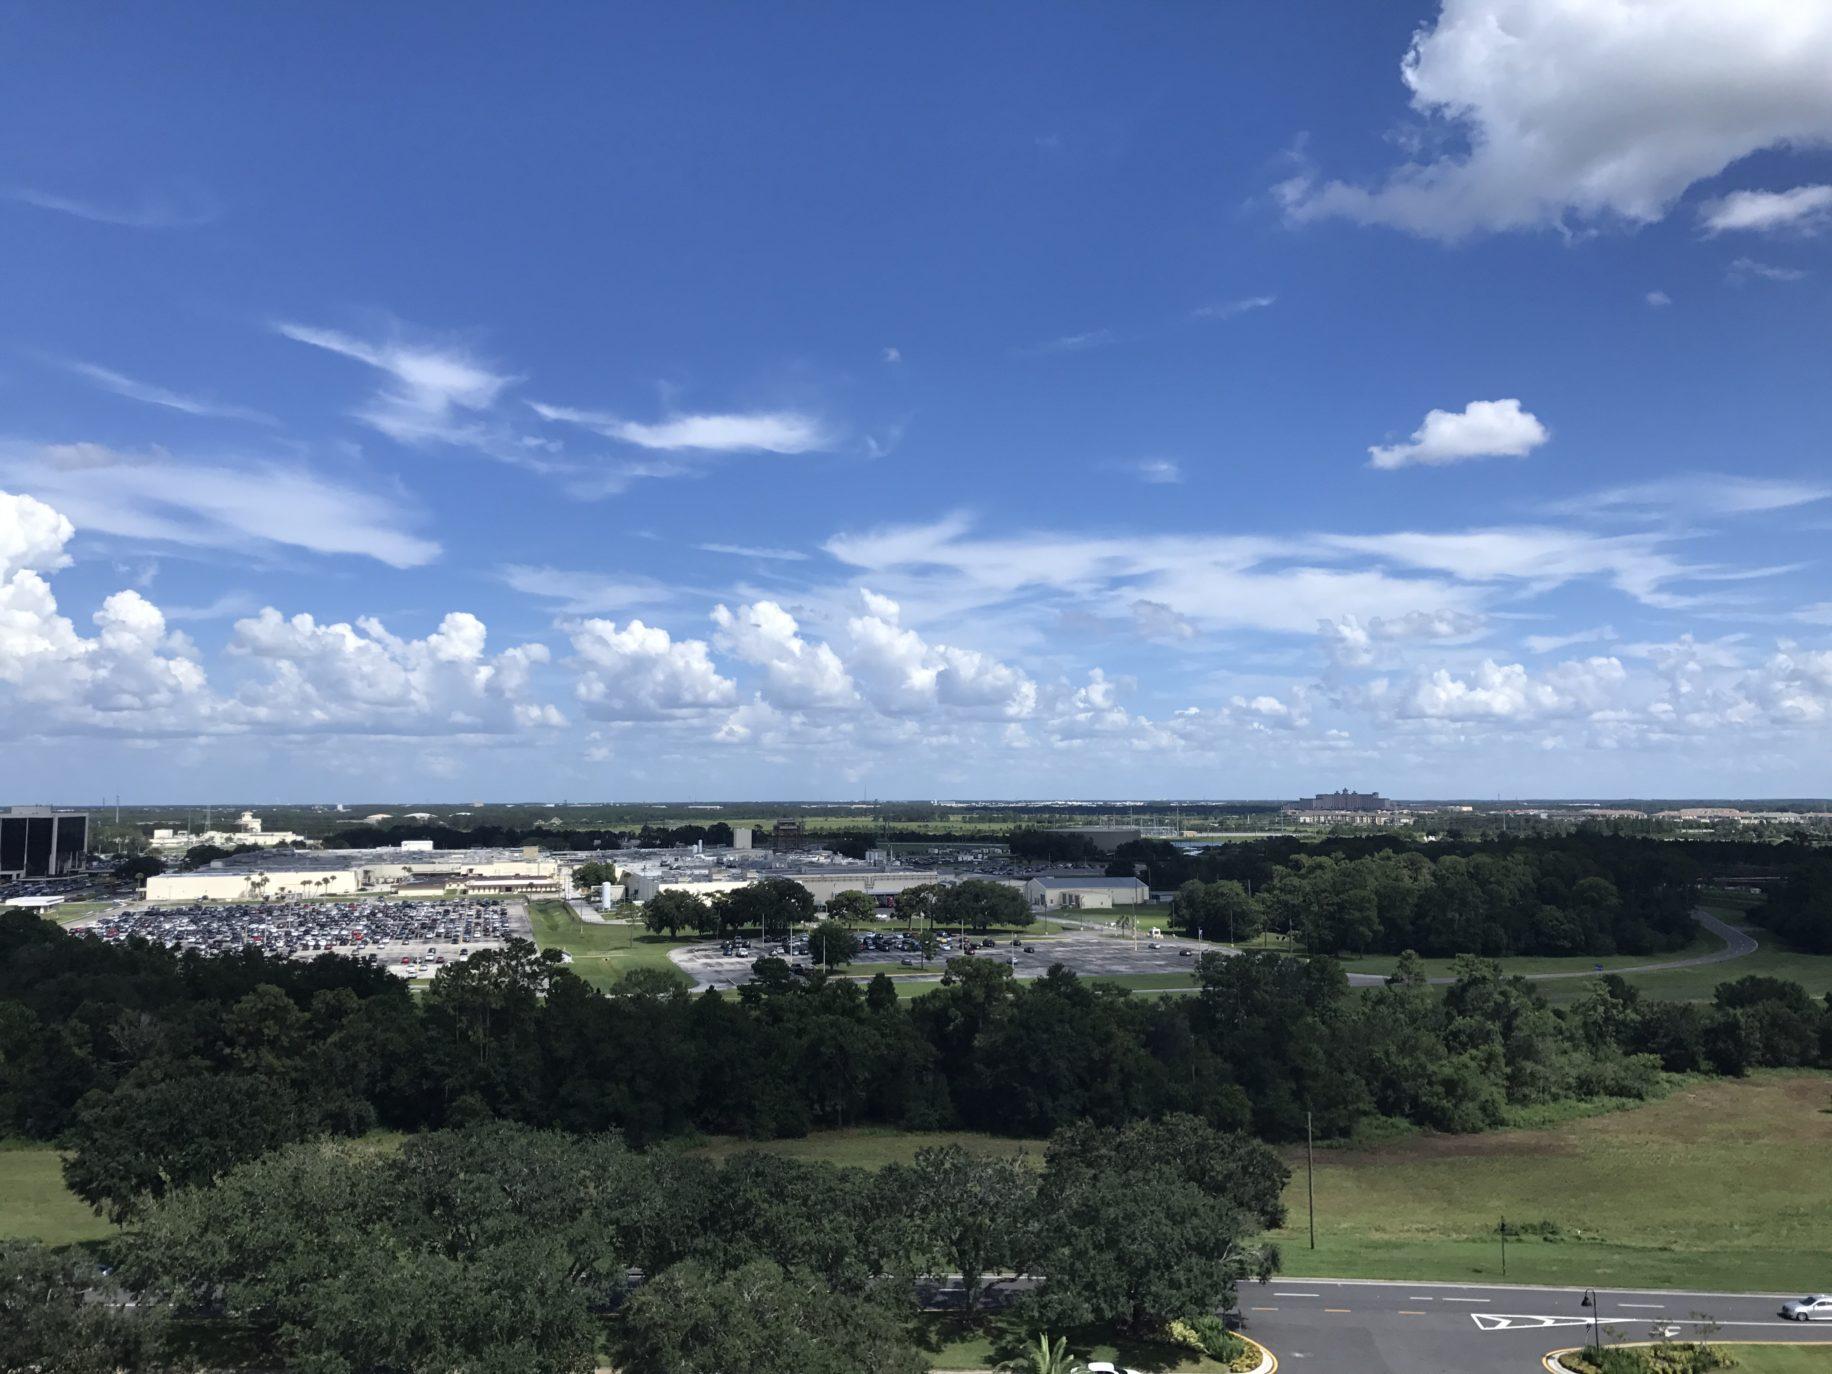 Nice views from the Orlando Eye \ Image: Dakster Sullivan